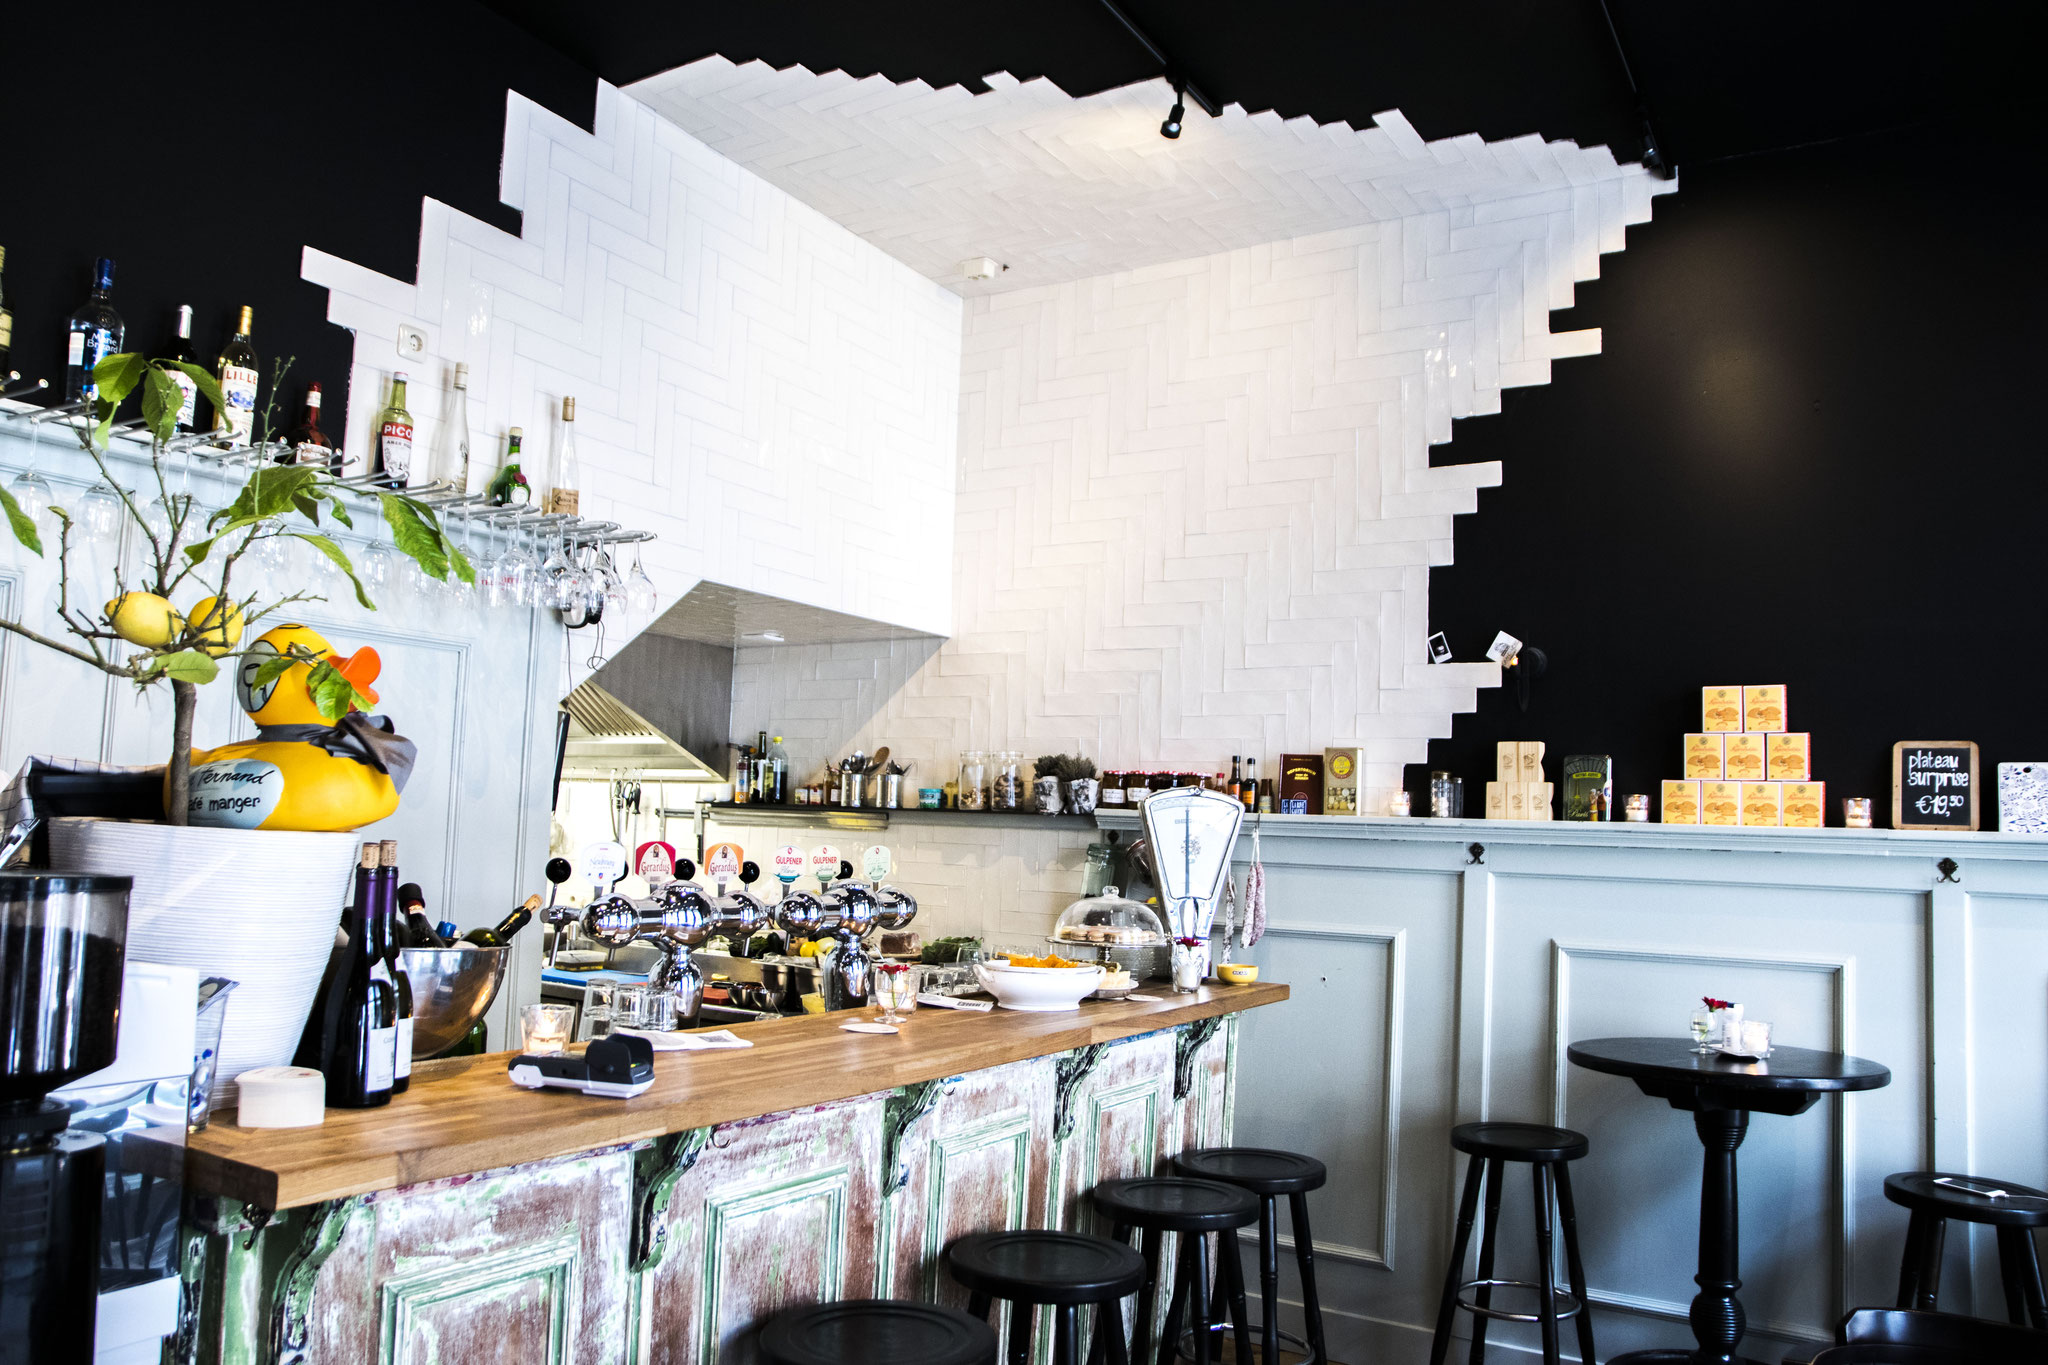 Le Fernand Café Manger - Maastricht - Fotografie